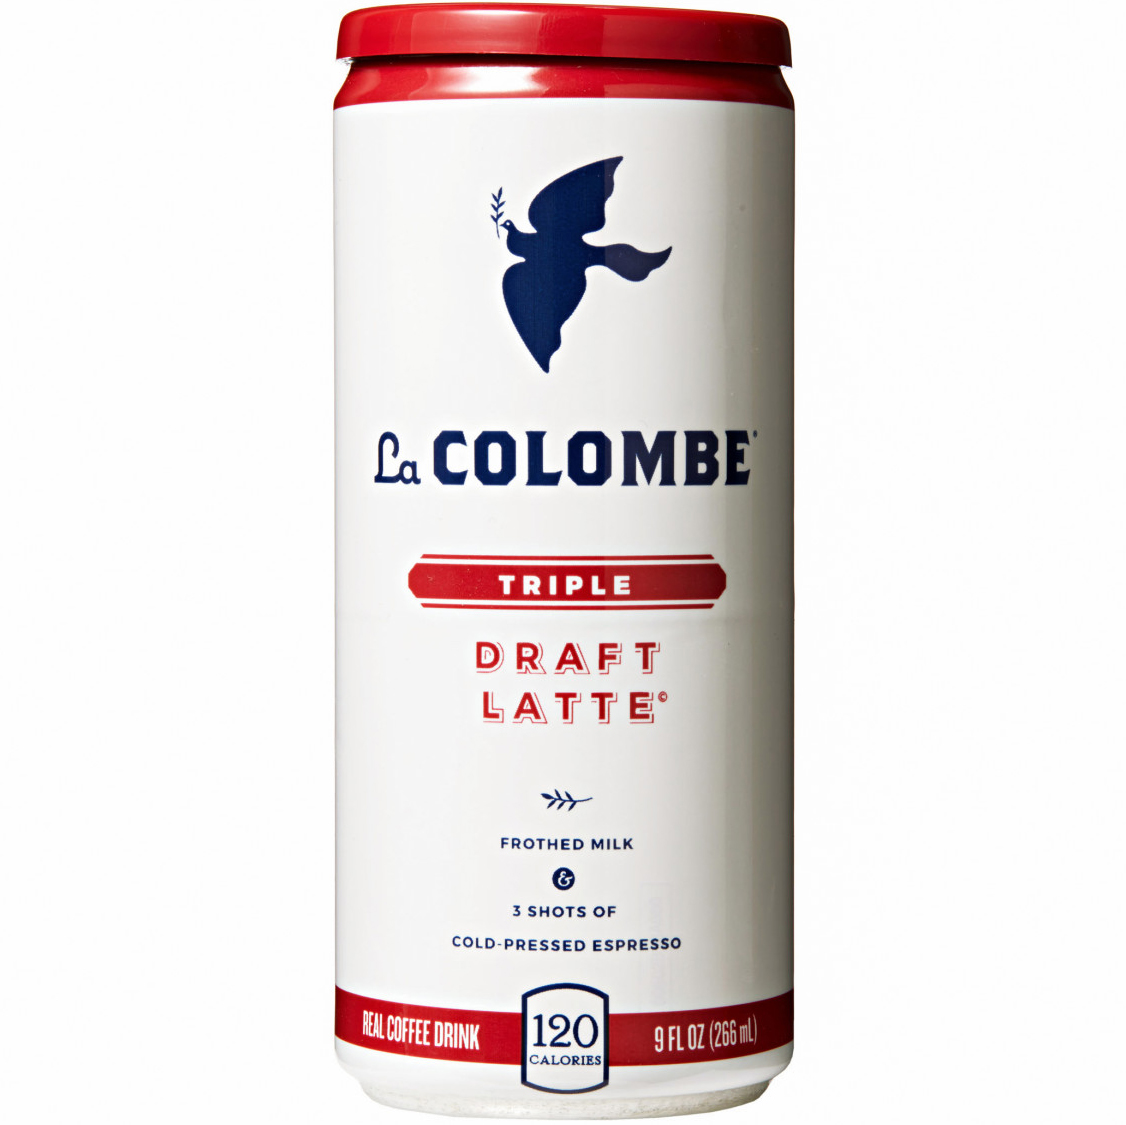 LA COLOMBE - DRAFT LATTE - (Triple) - 9oz